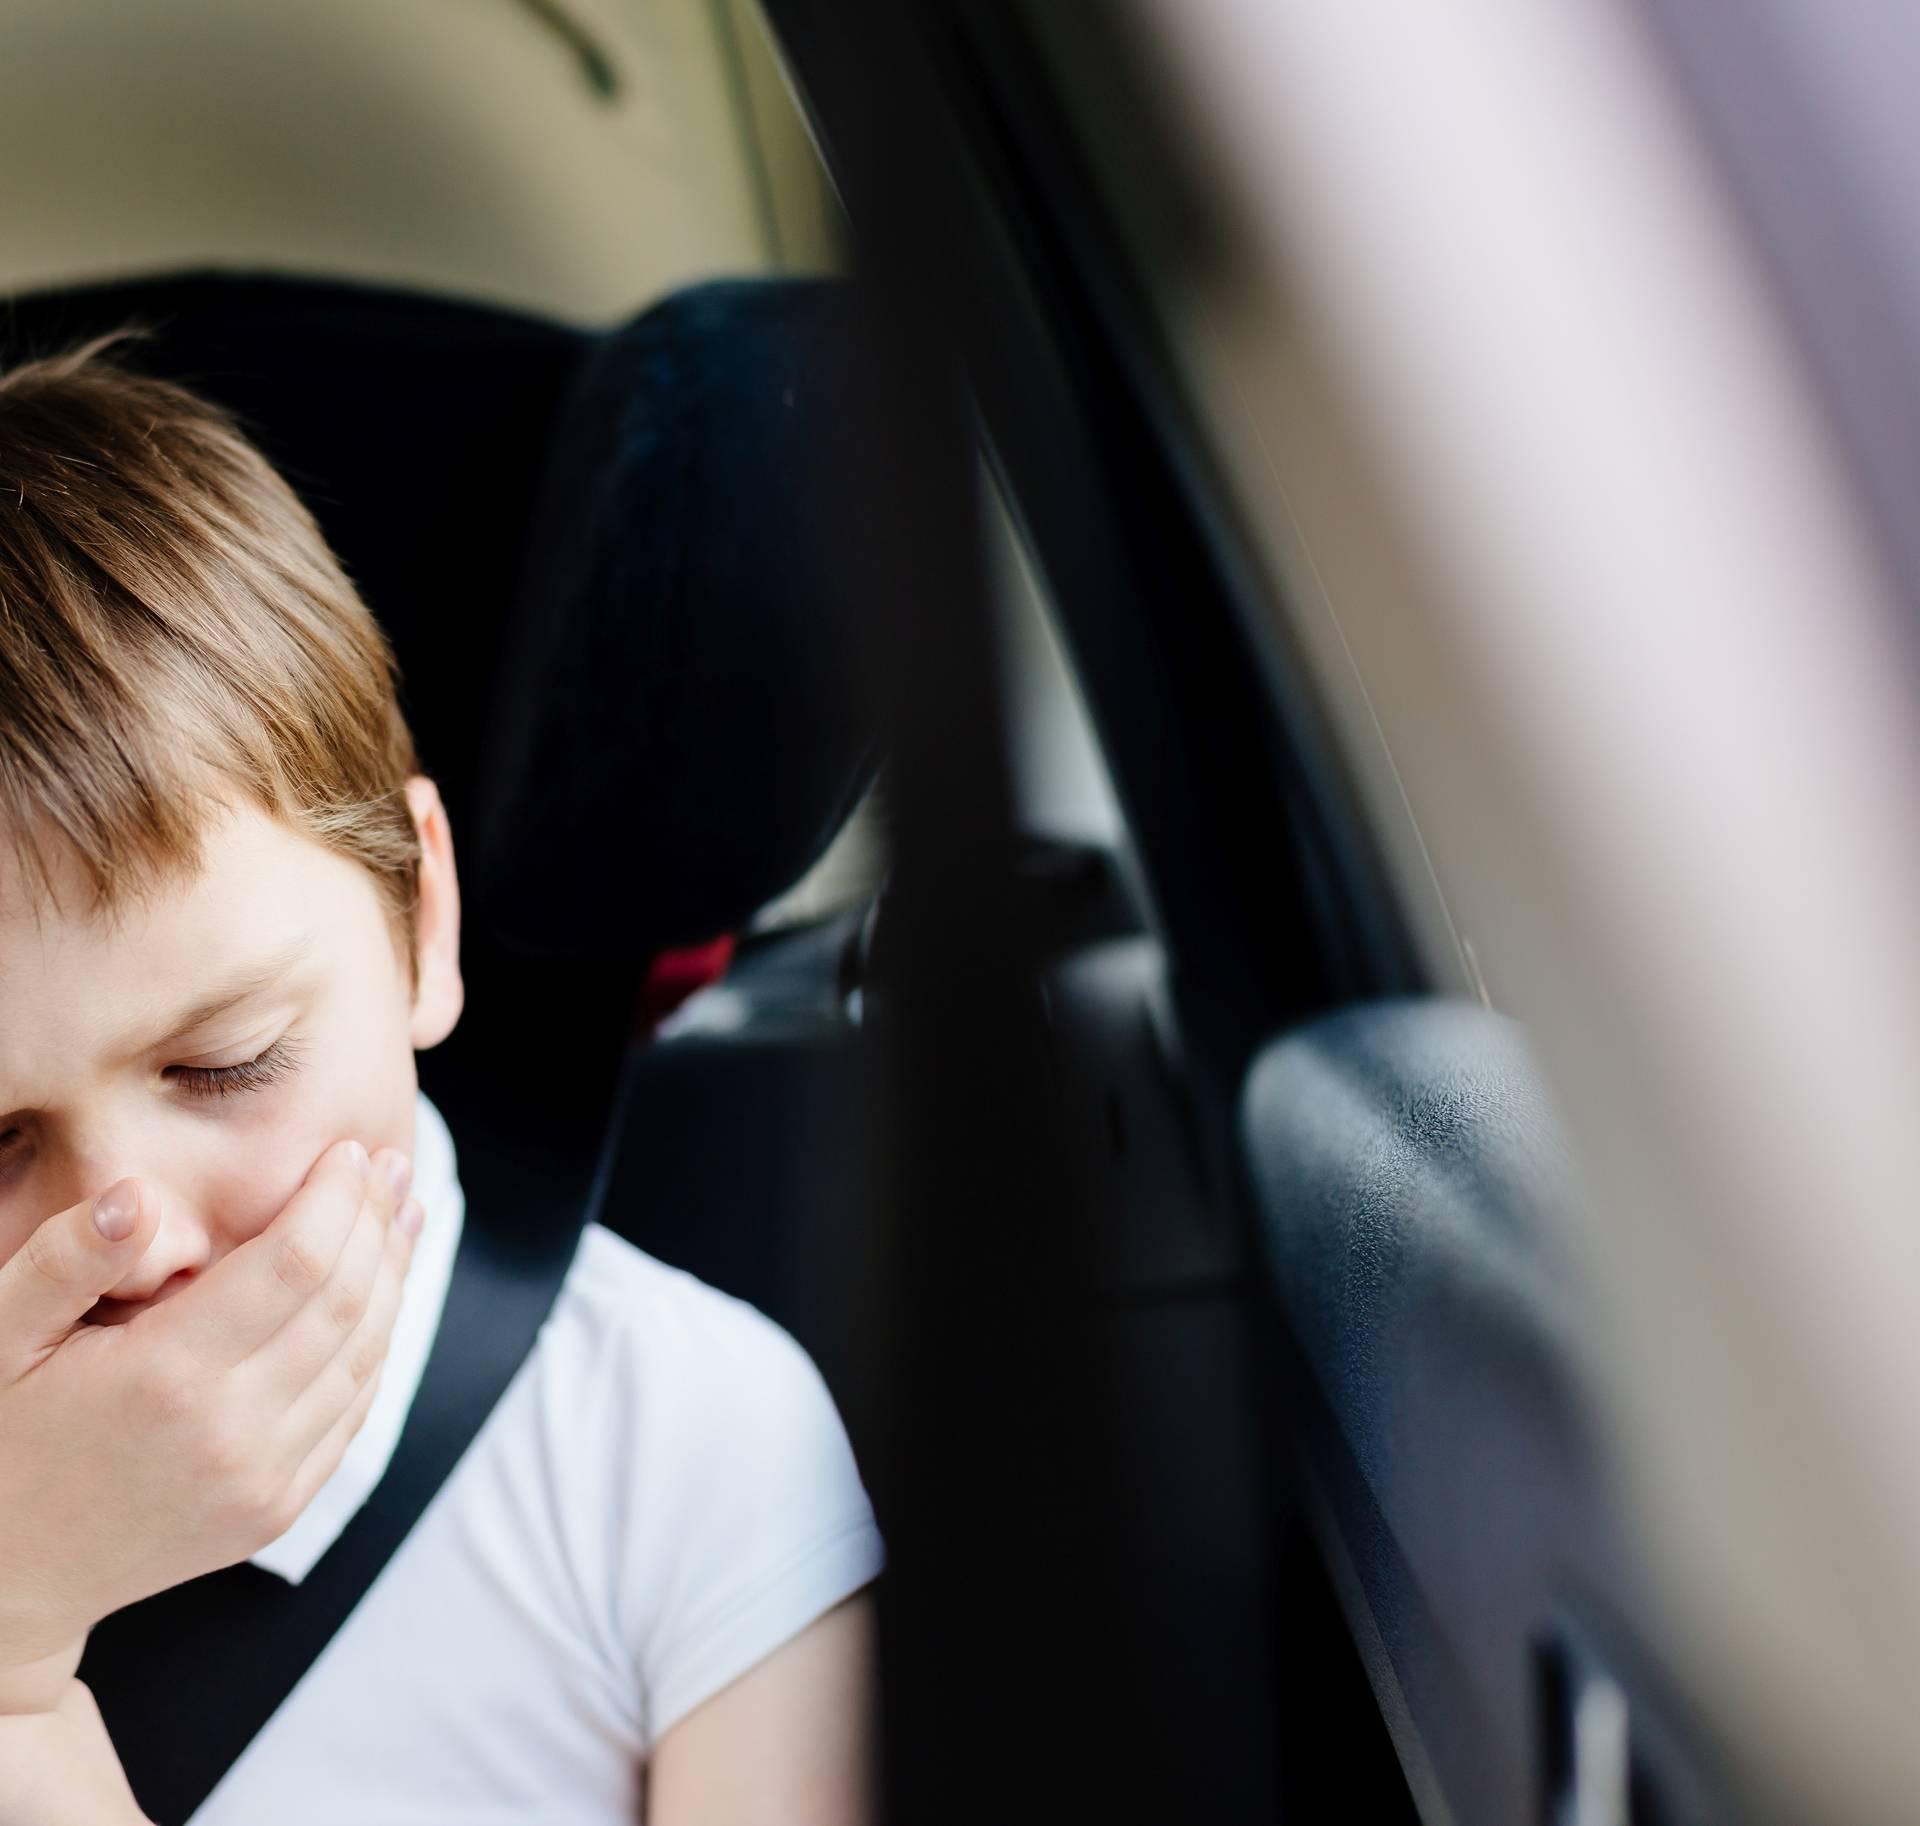 Narukvica protiv mučnine u vožnji i načini kako si pomoći